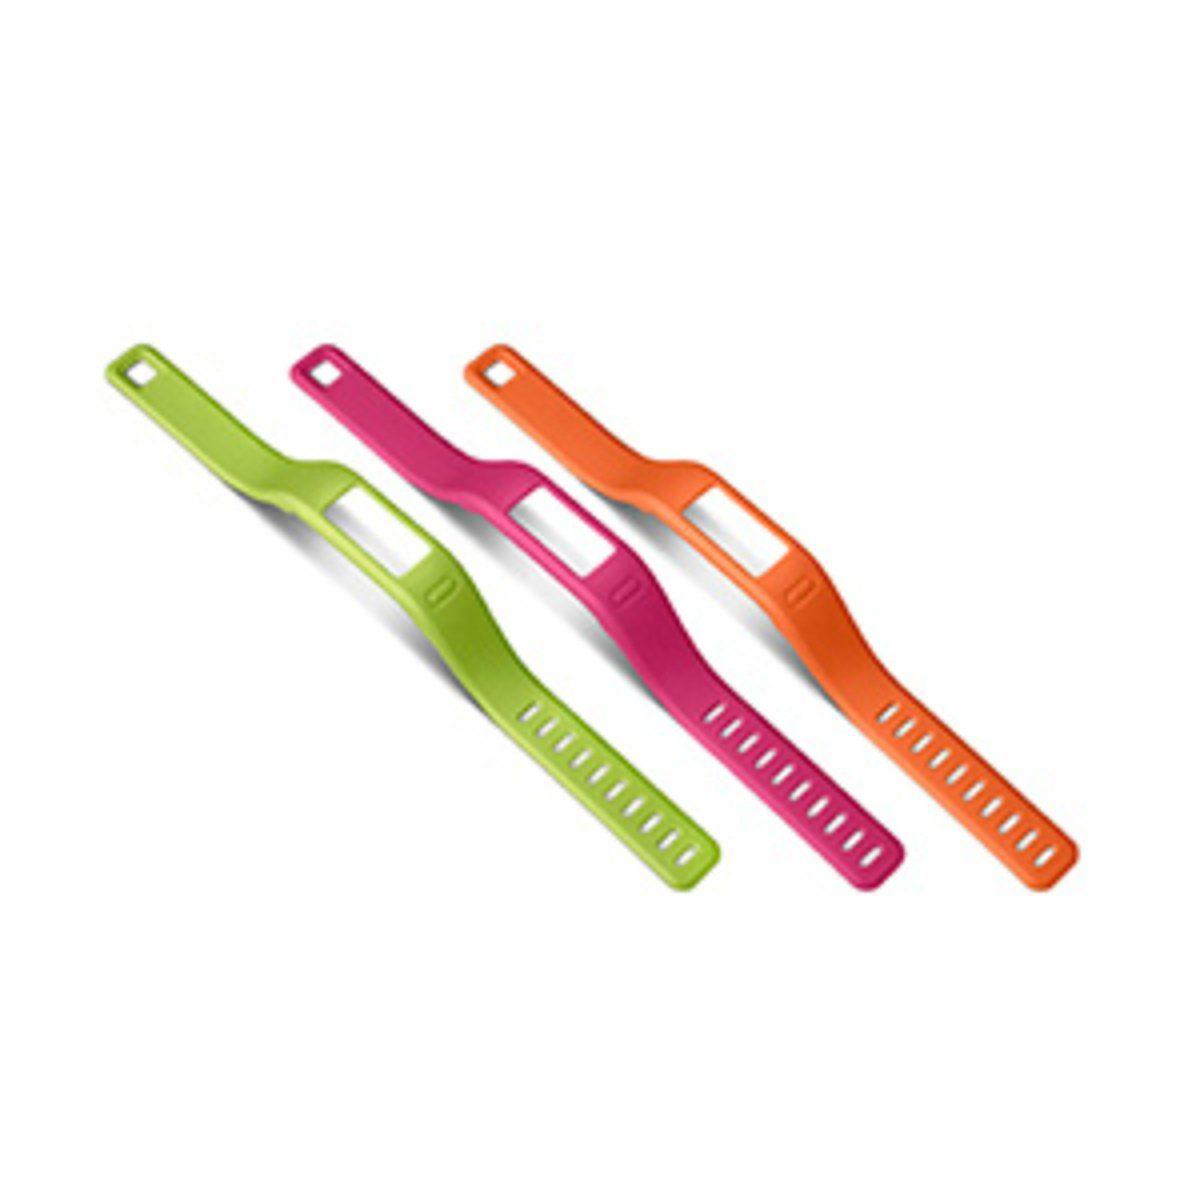 Garmin Ersatzarmbänder »vivofit , lila, grün (groß)«